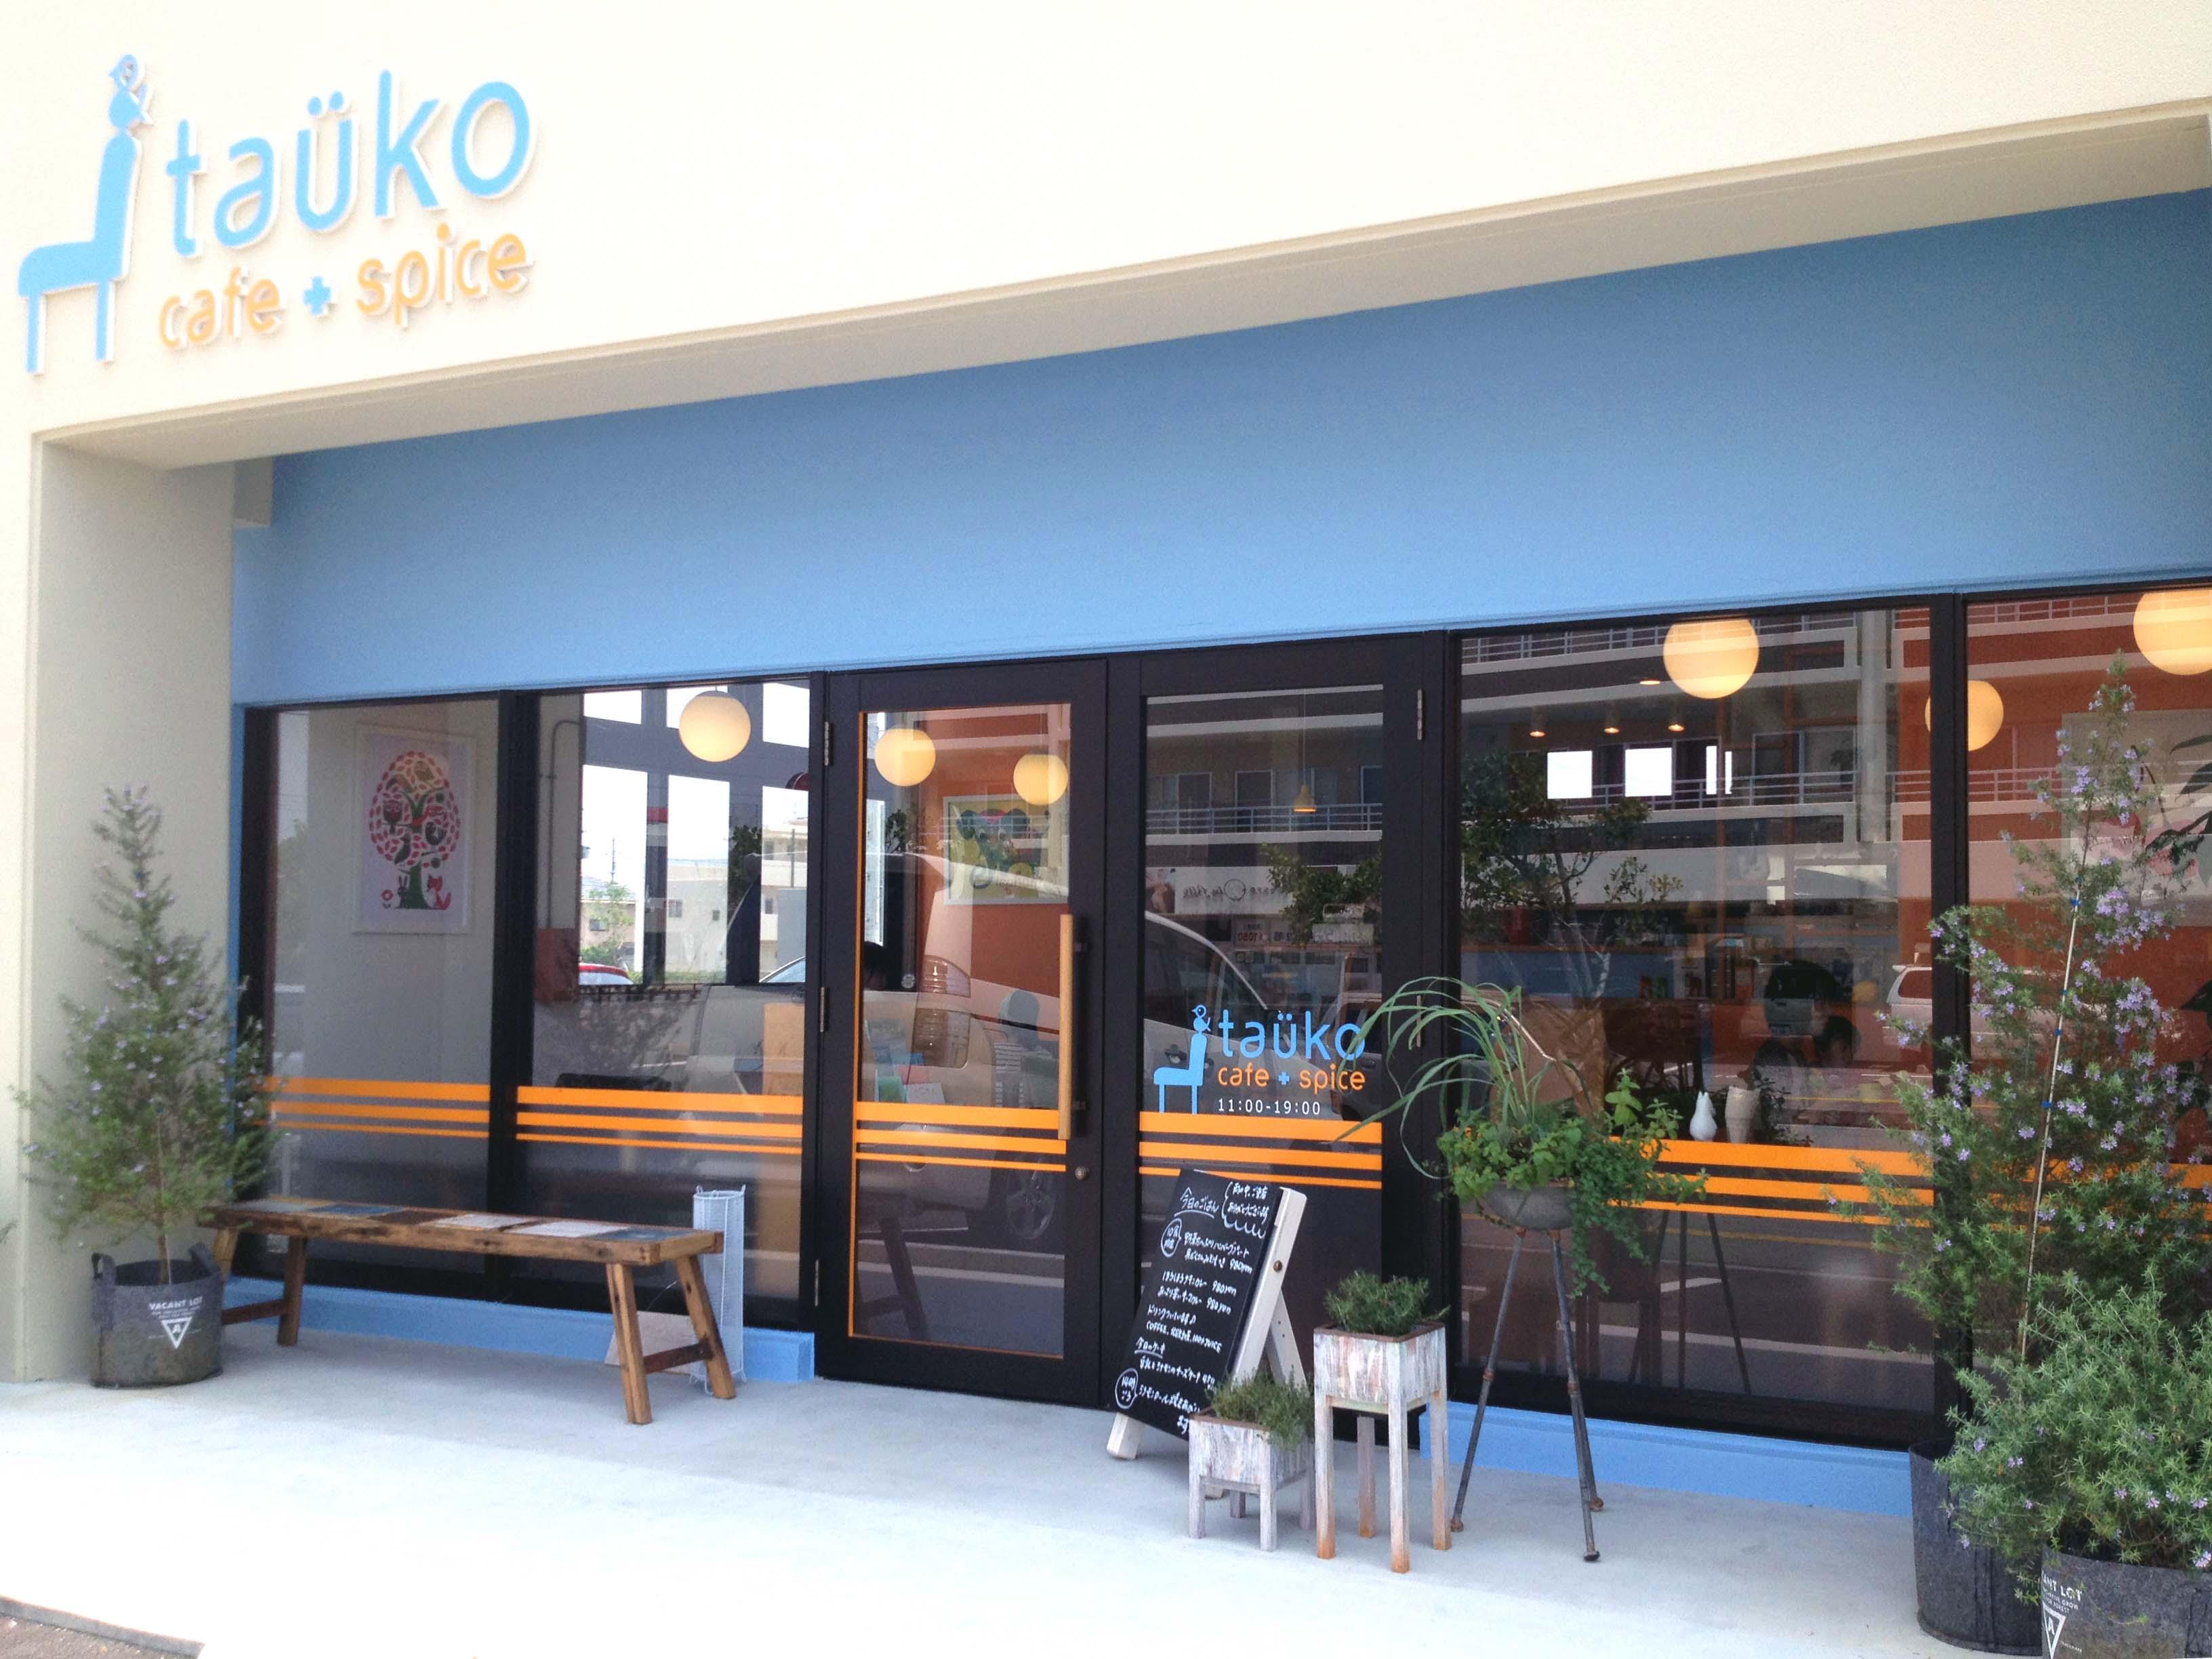 cafe+spice tauko2